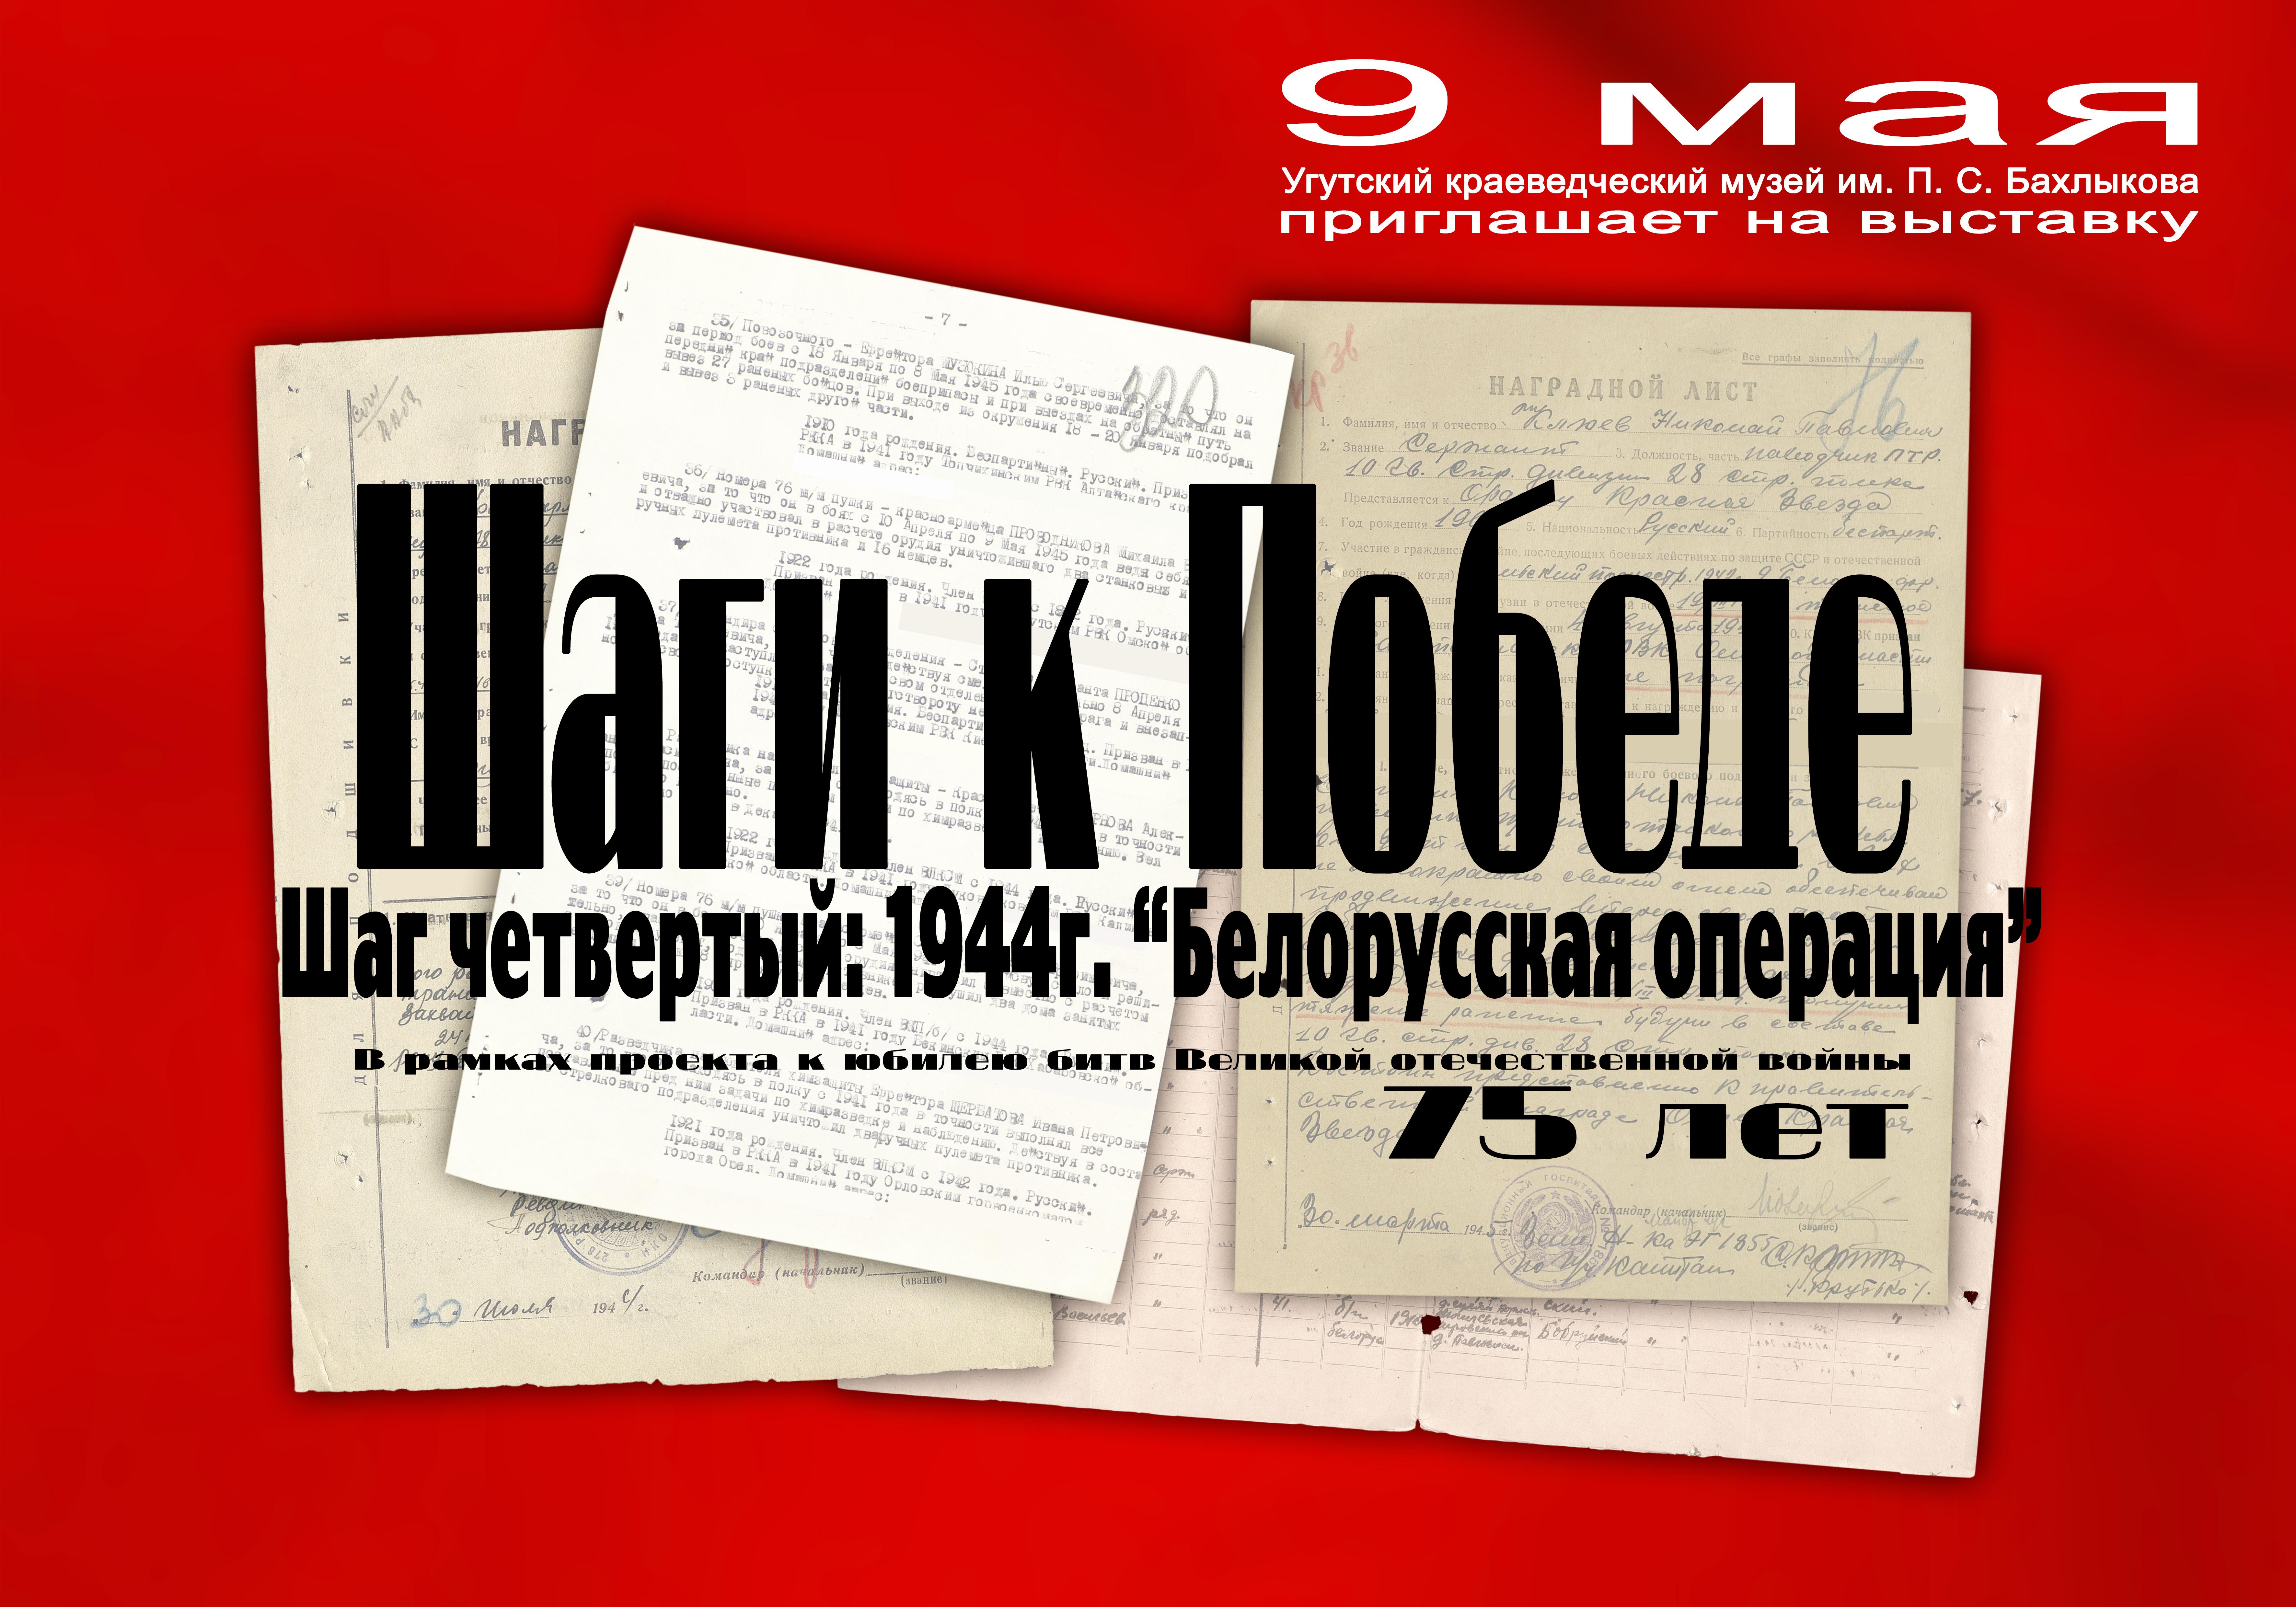 Выставка Шаги к победе Шаг четвёртый: 1944 г. «Белорусская операция»